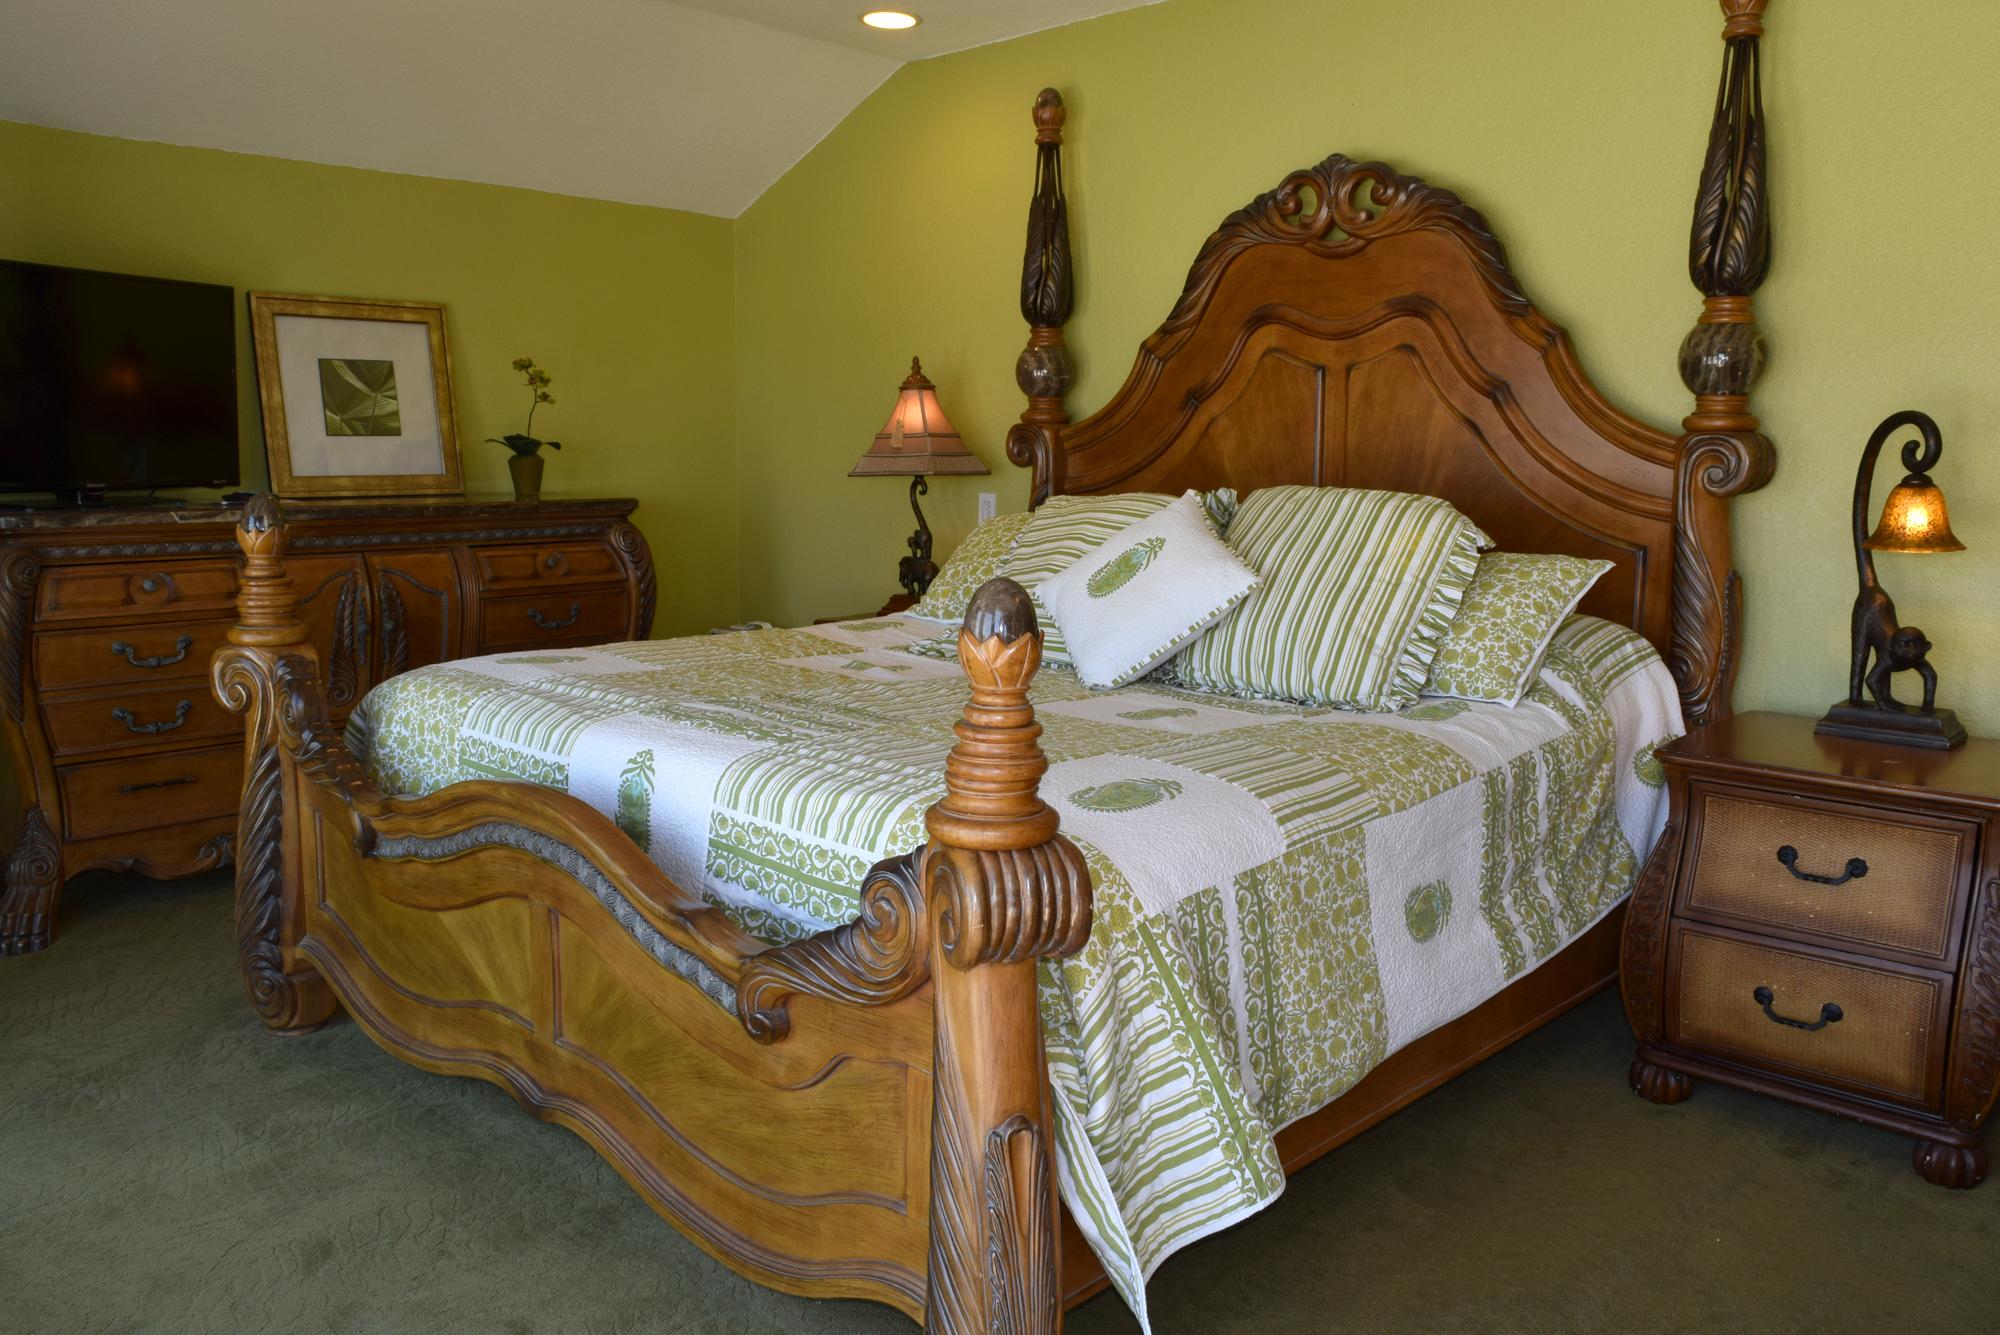 Maldonado 1010 House/Cottage rental in Pensacola Beach House Rentals in Pensacola Beach Florida - #14